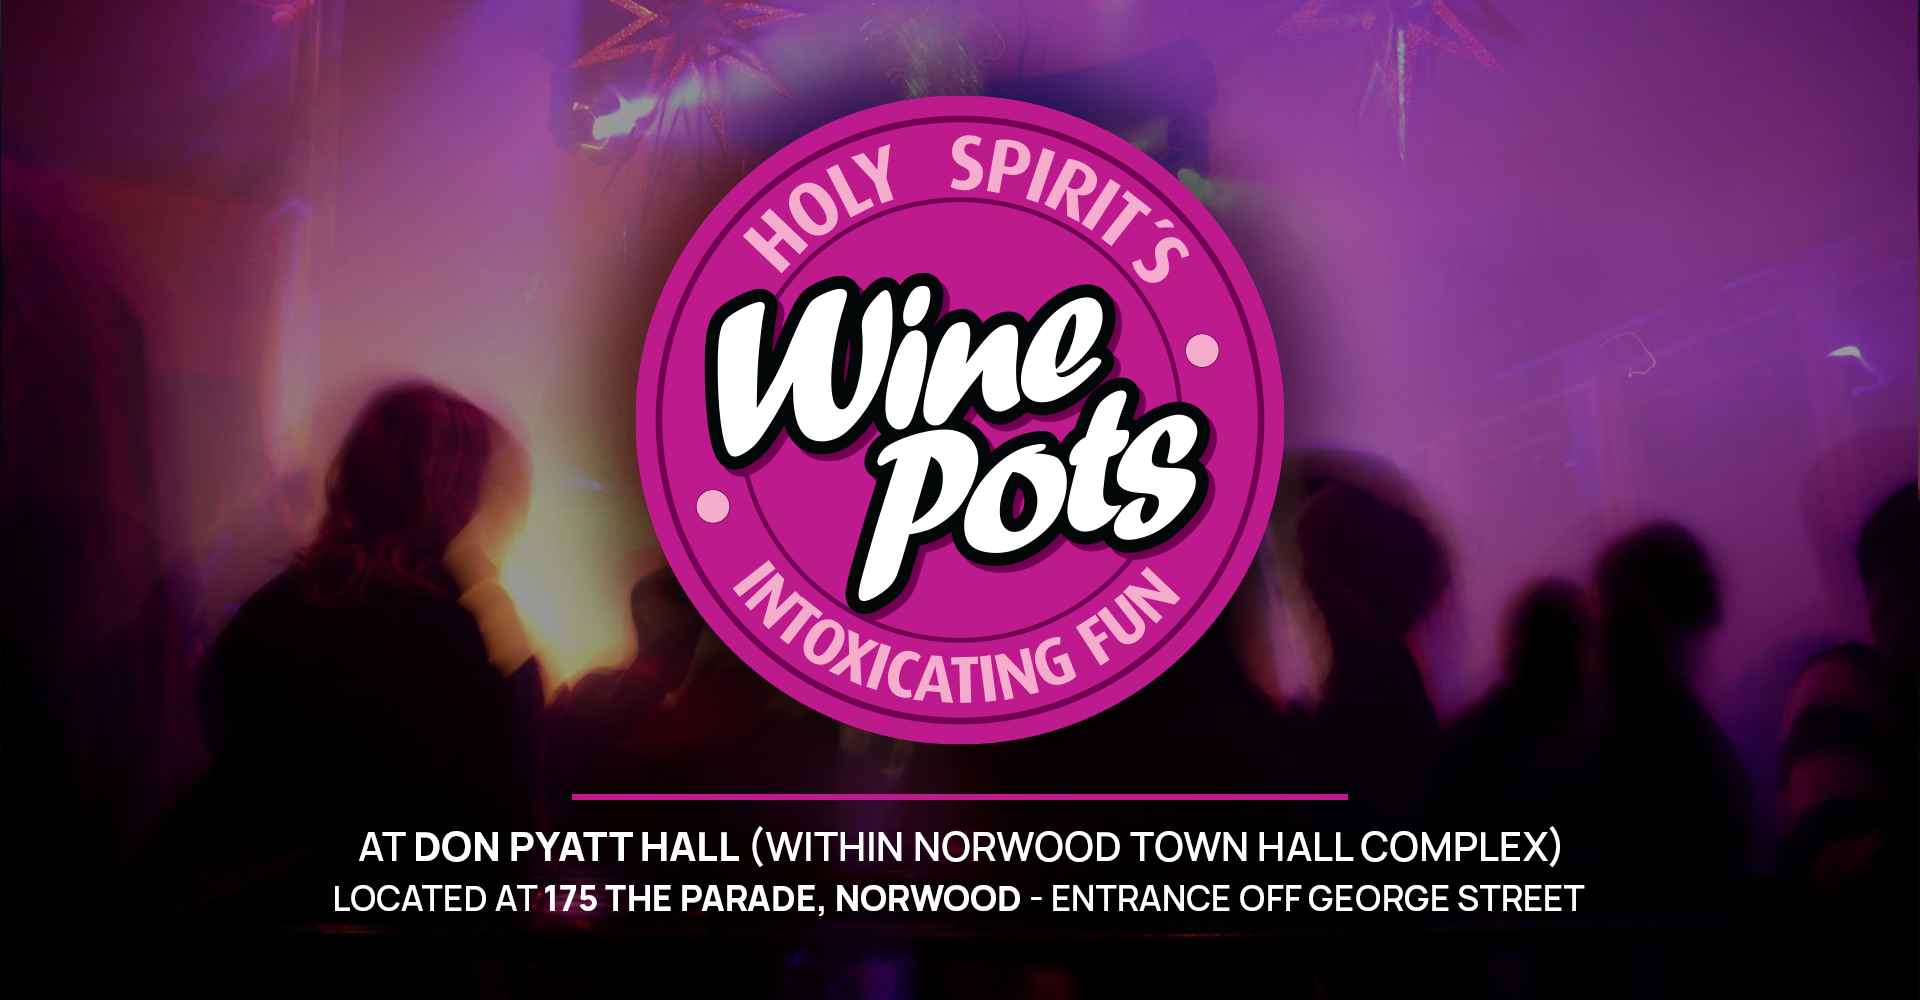 Holy Spirit's Wine Pots